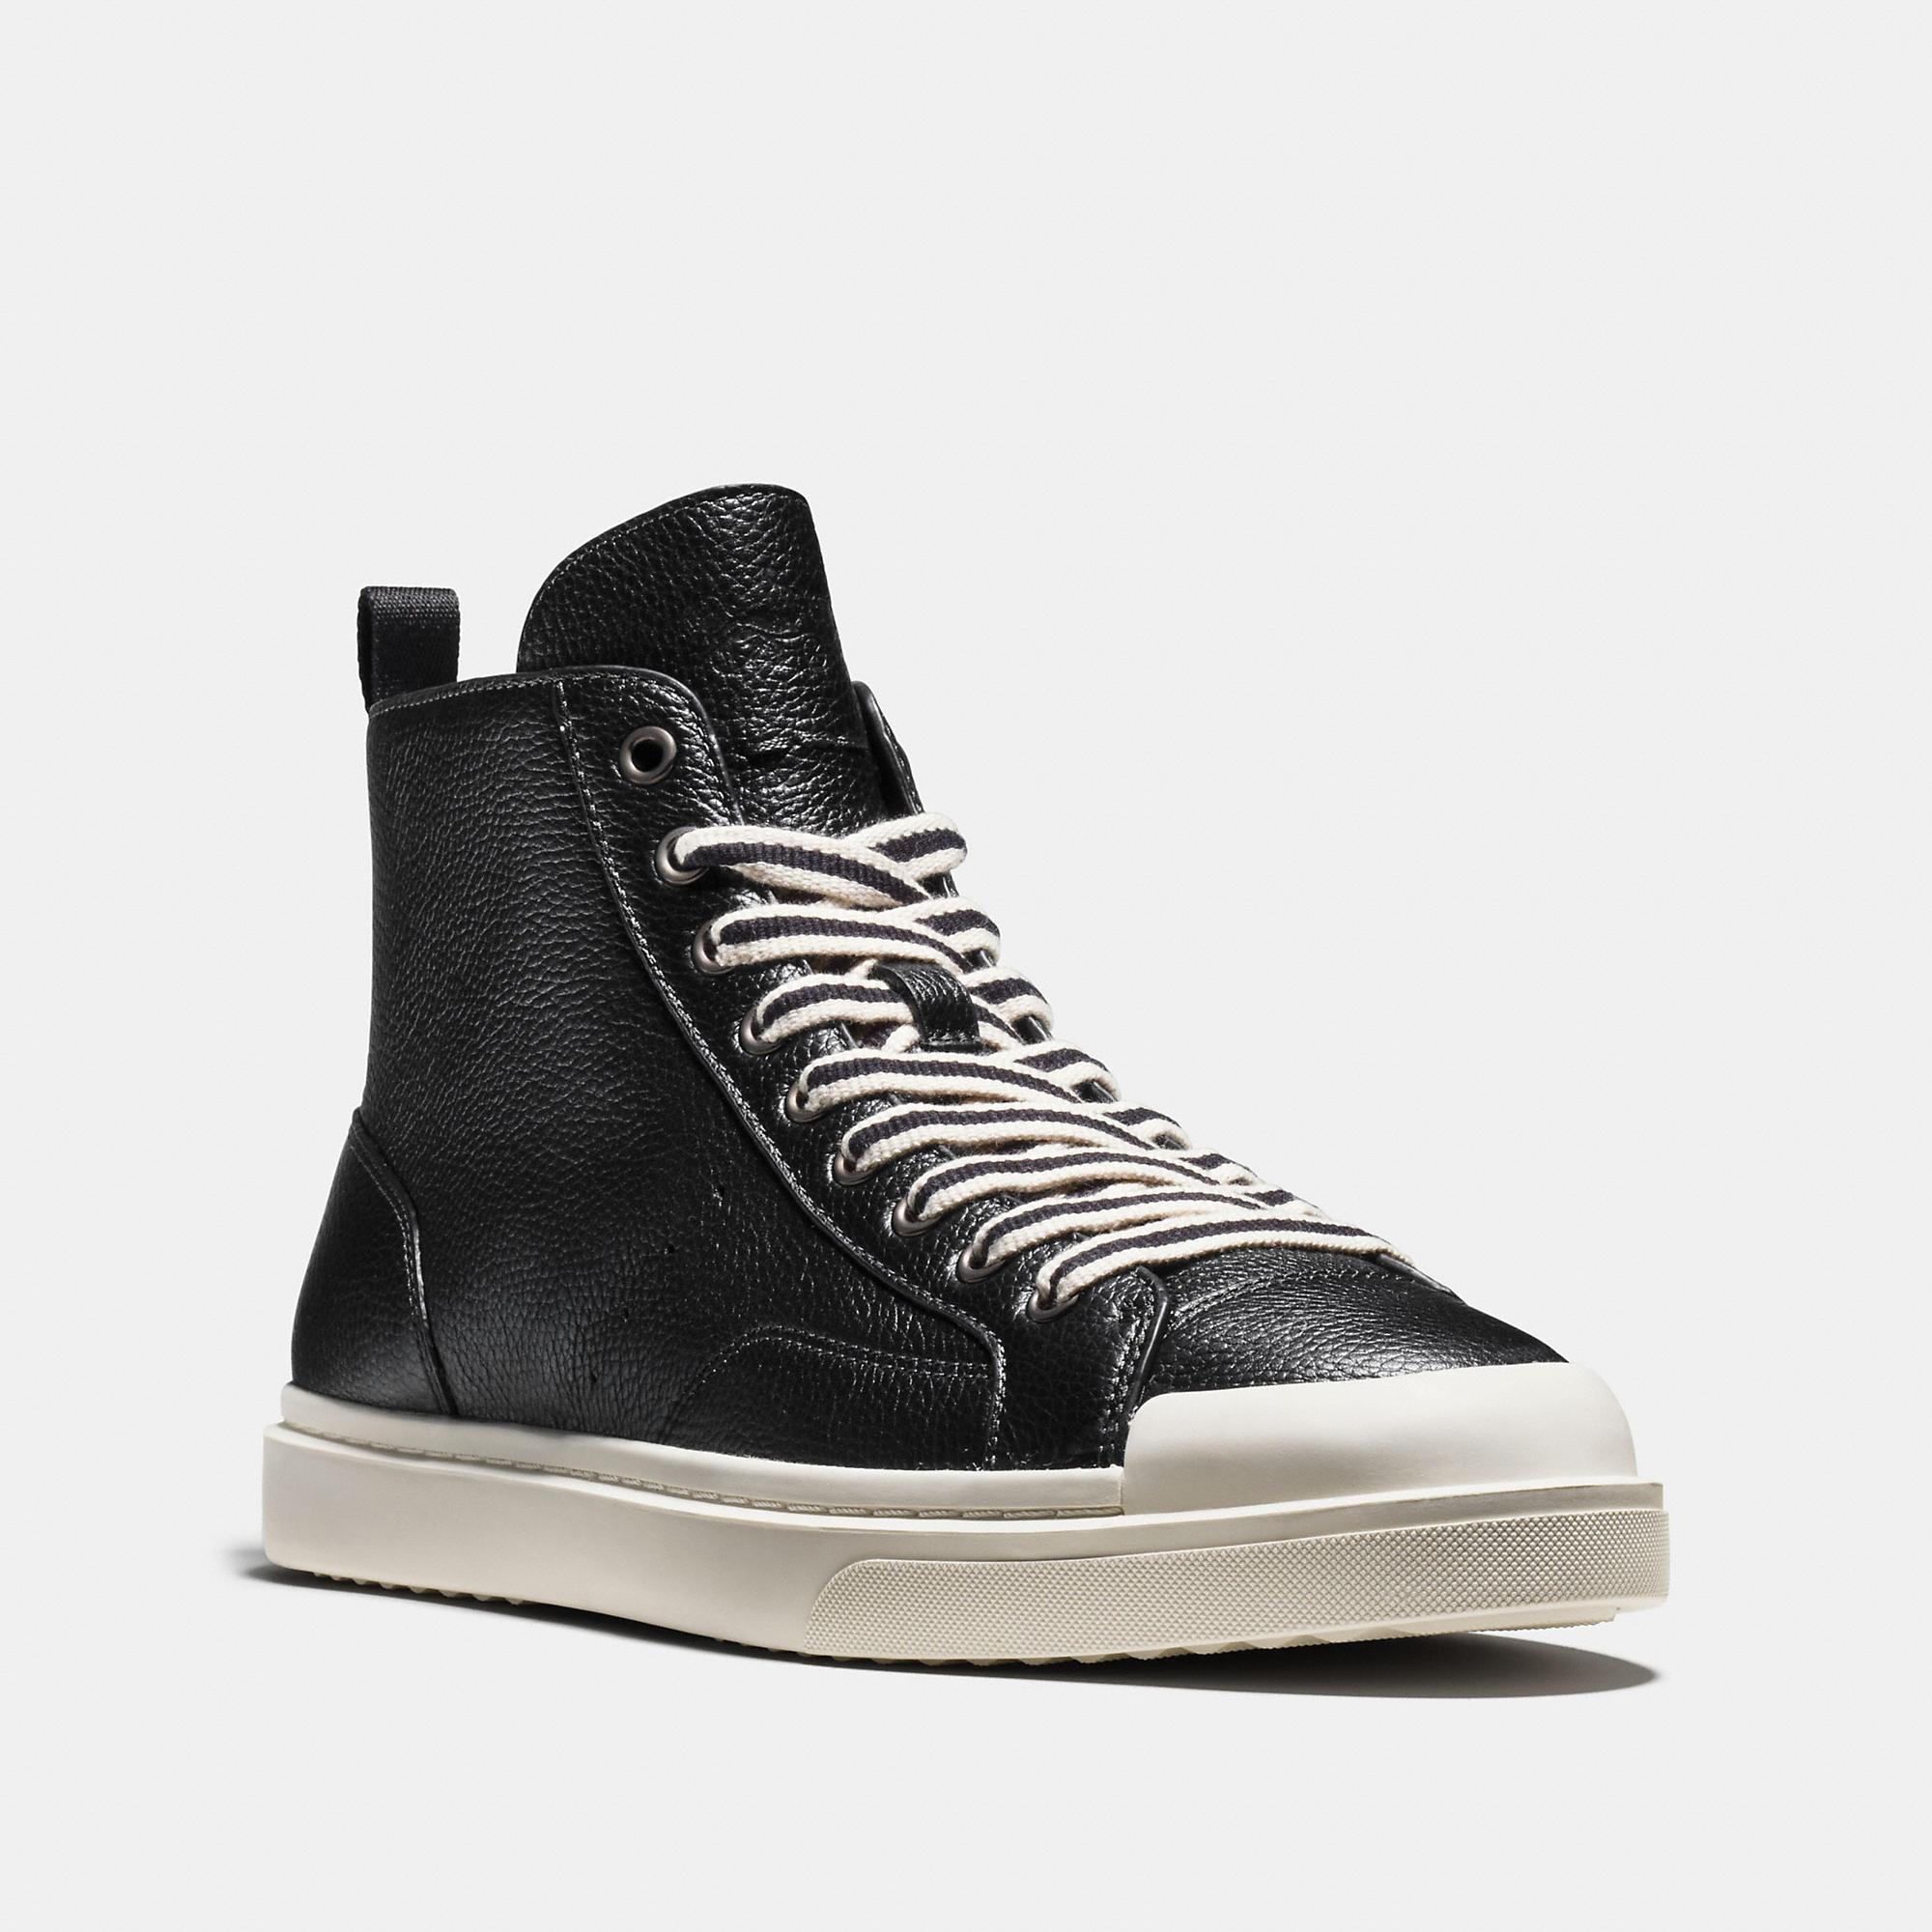 Coach C214 High Top Sneaker